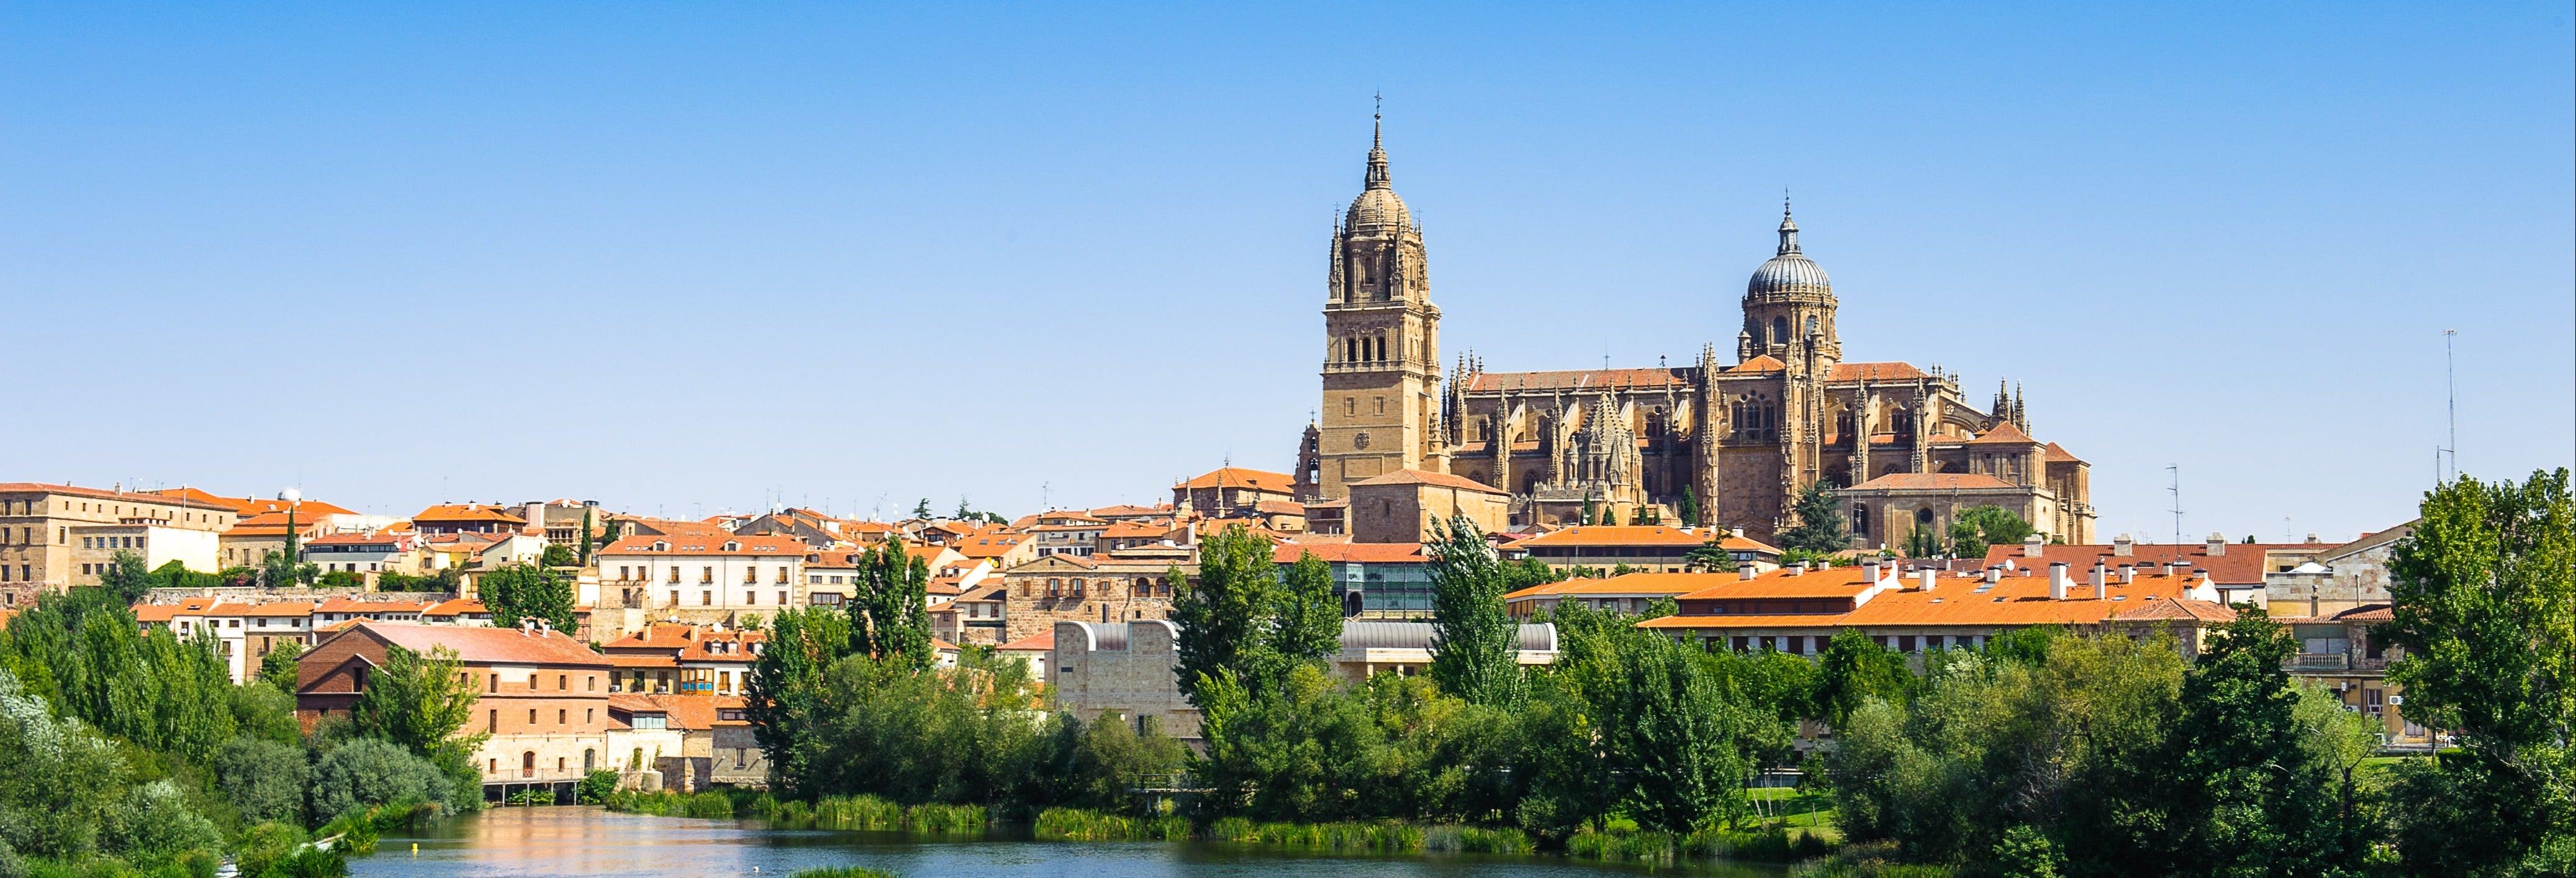 Tour de Salamanca al completo